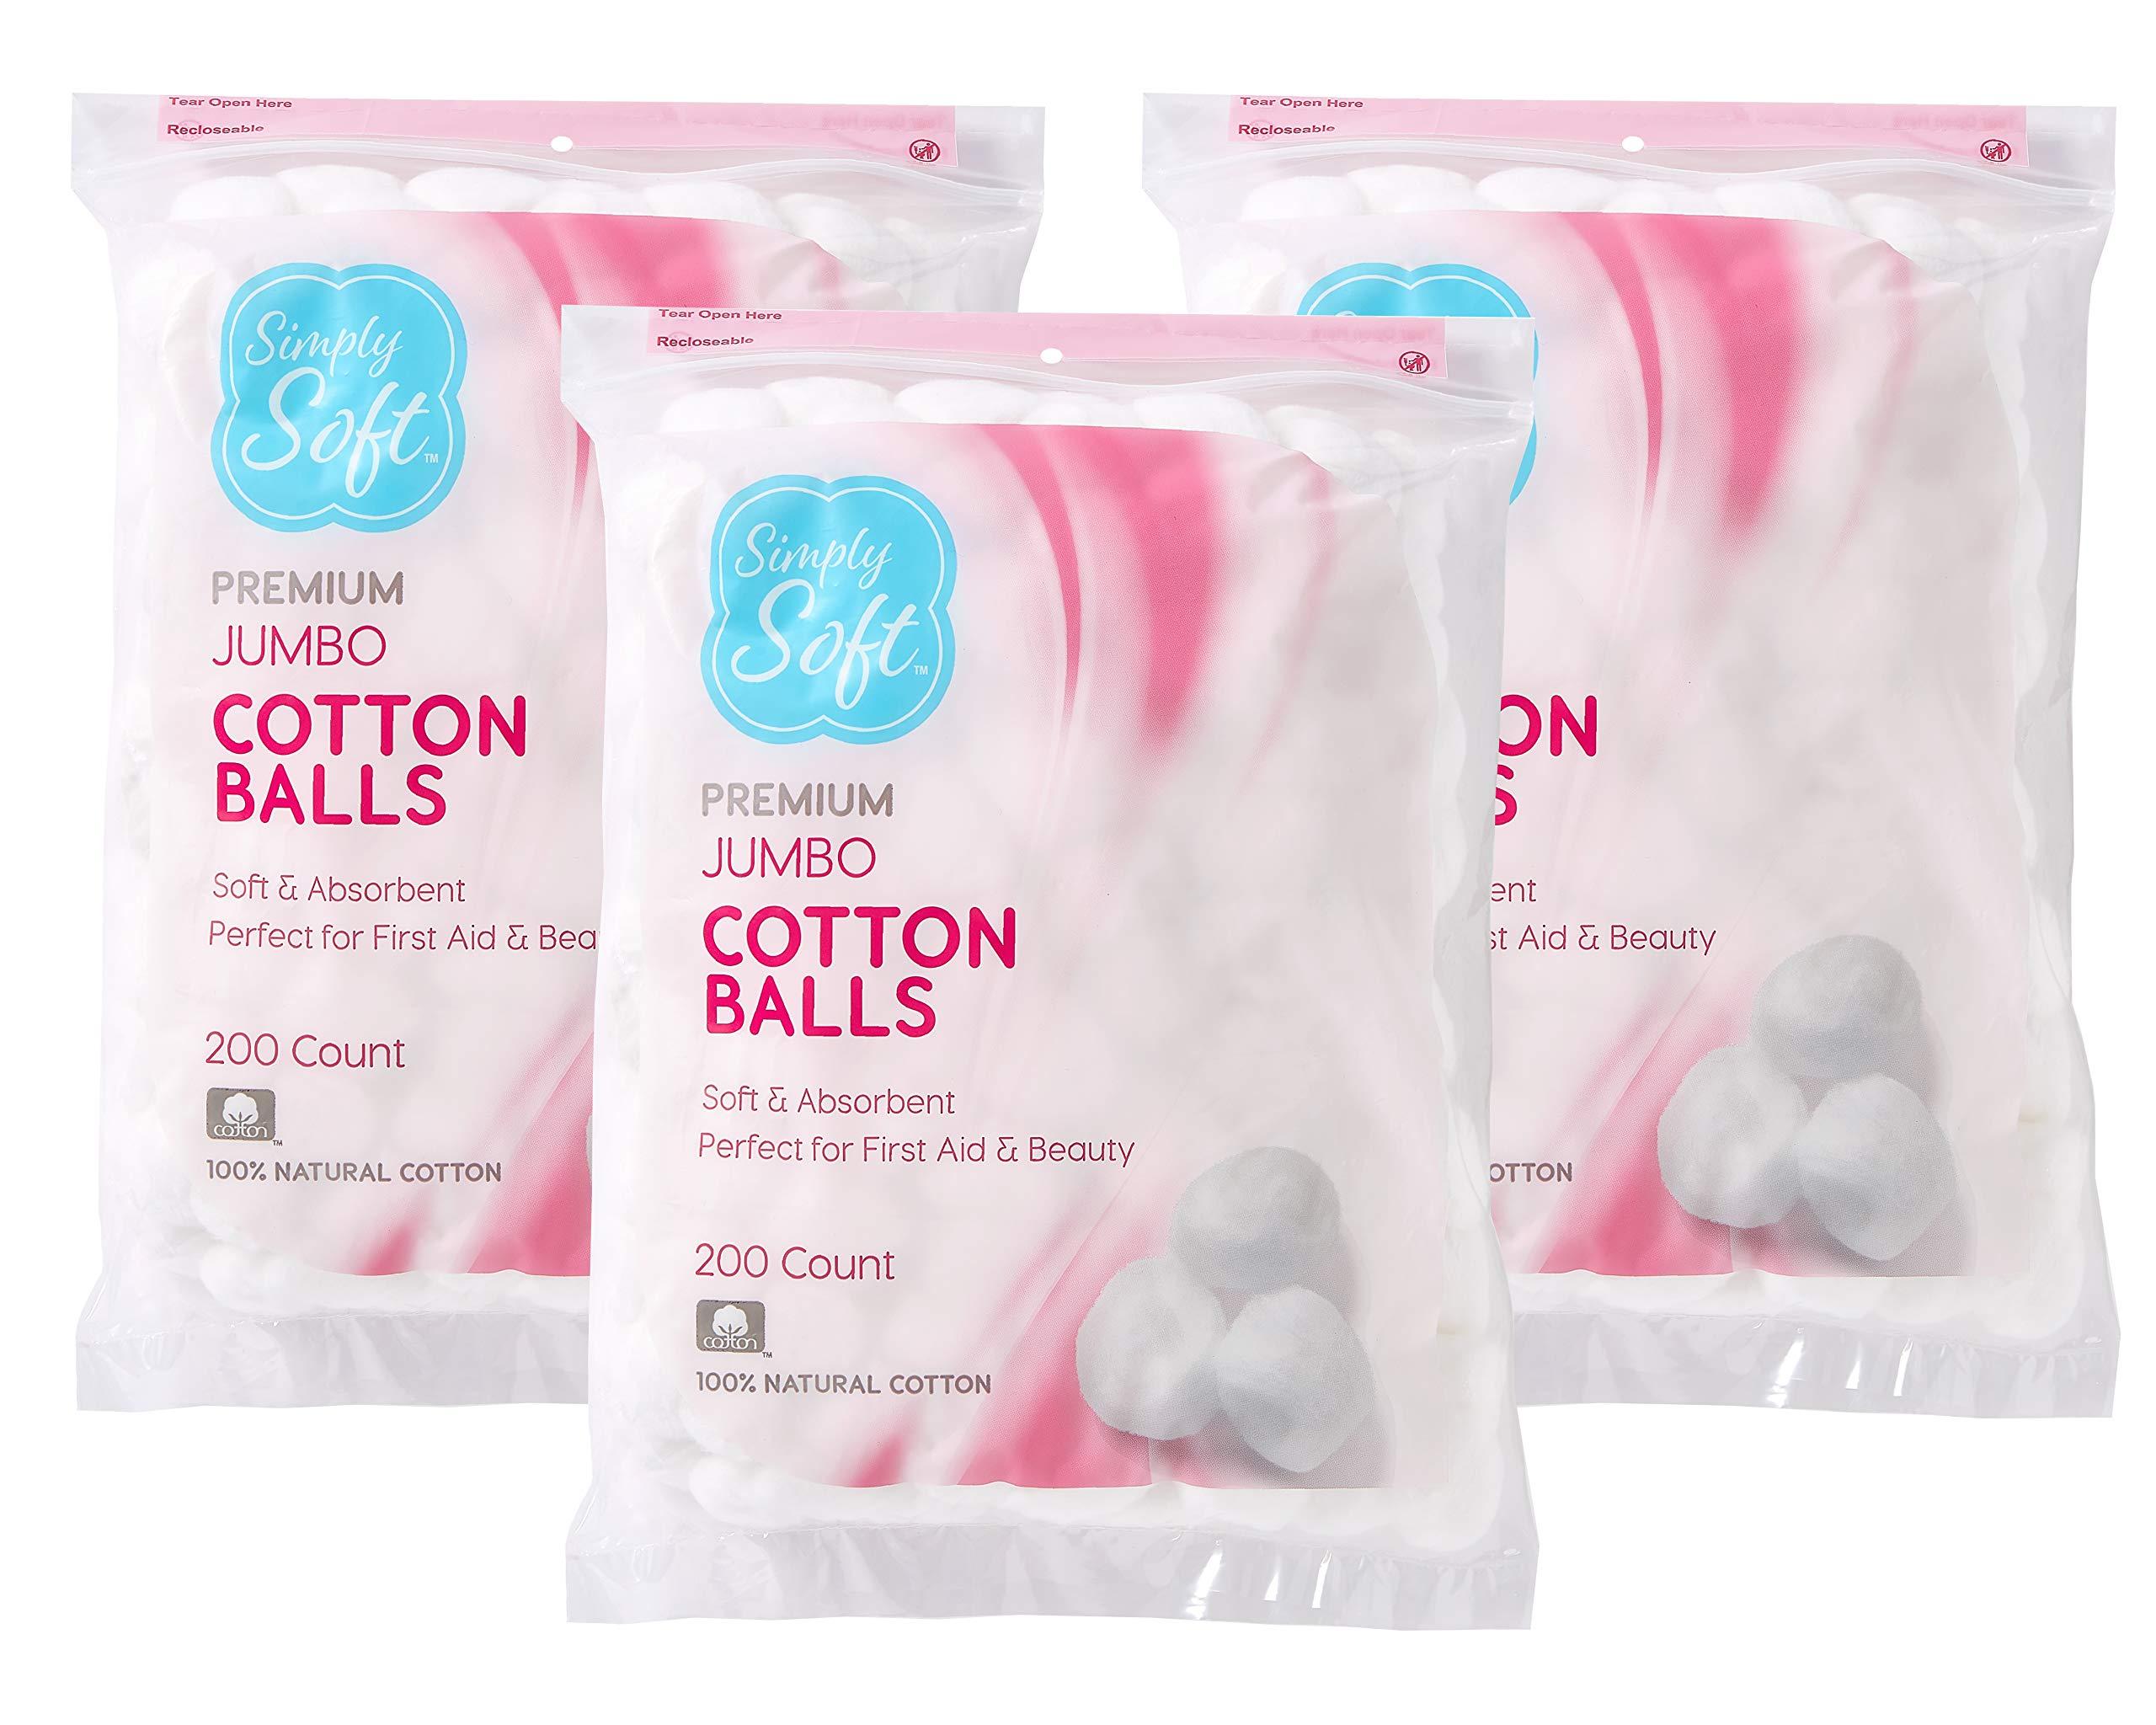 Simply Soft Premium Cotton Balls, 100% Pure Cotton, Absorbent, 600 Count (3 - 200 Count Bags)